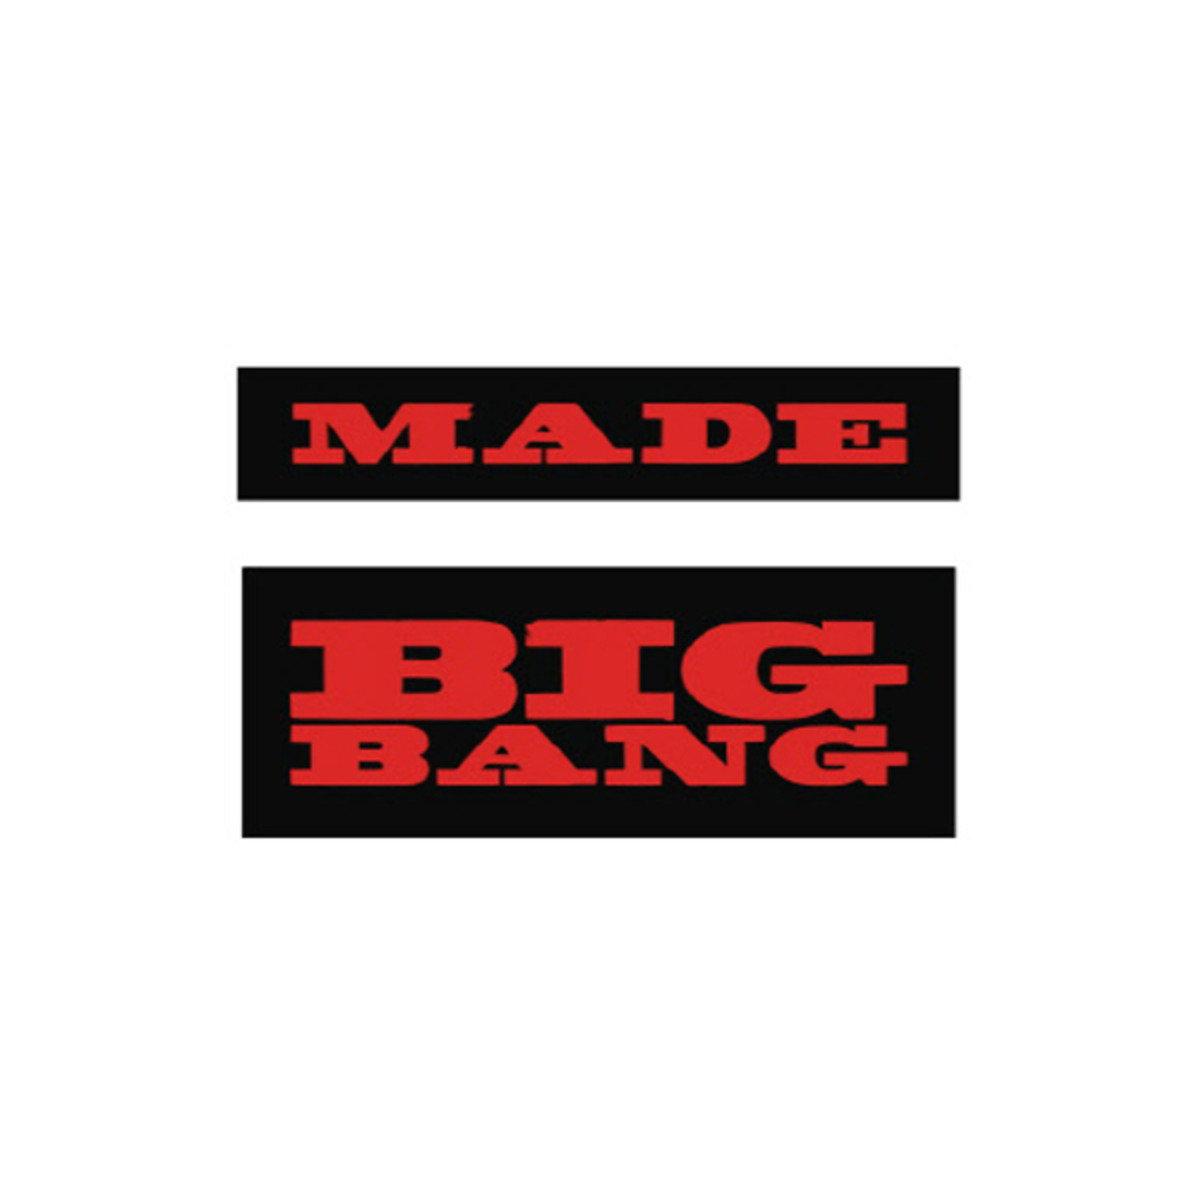 BIGBANG - 襟章 SET1 (MADE) [BIGBANG WORLD TOUR 'MADE' FINAL IN SEOUL]